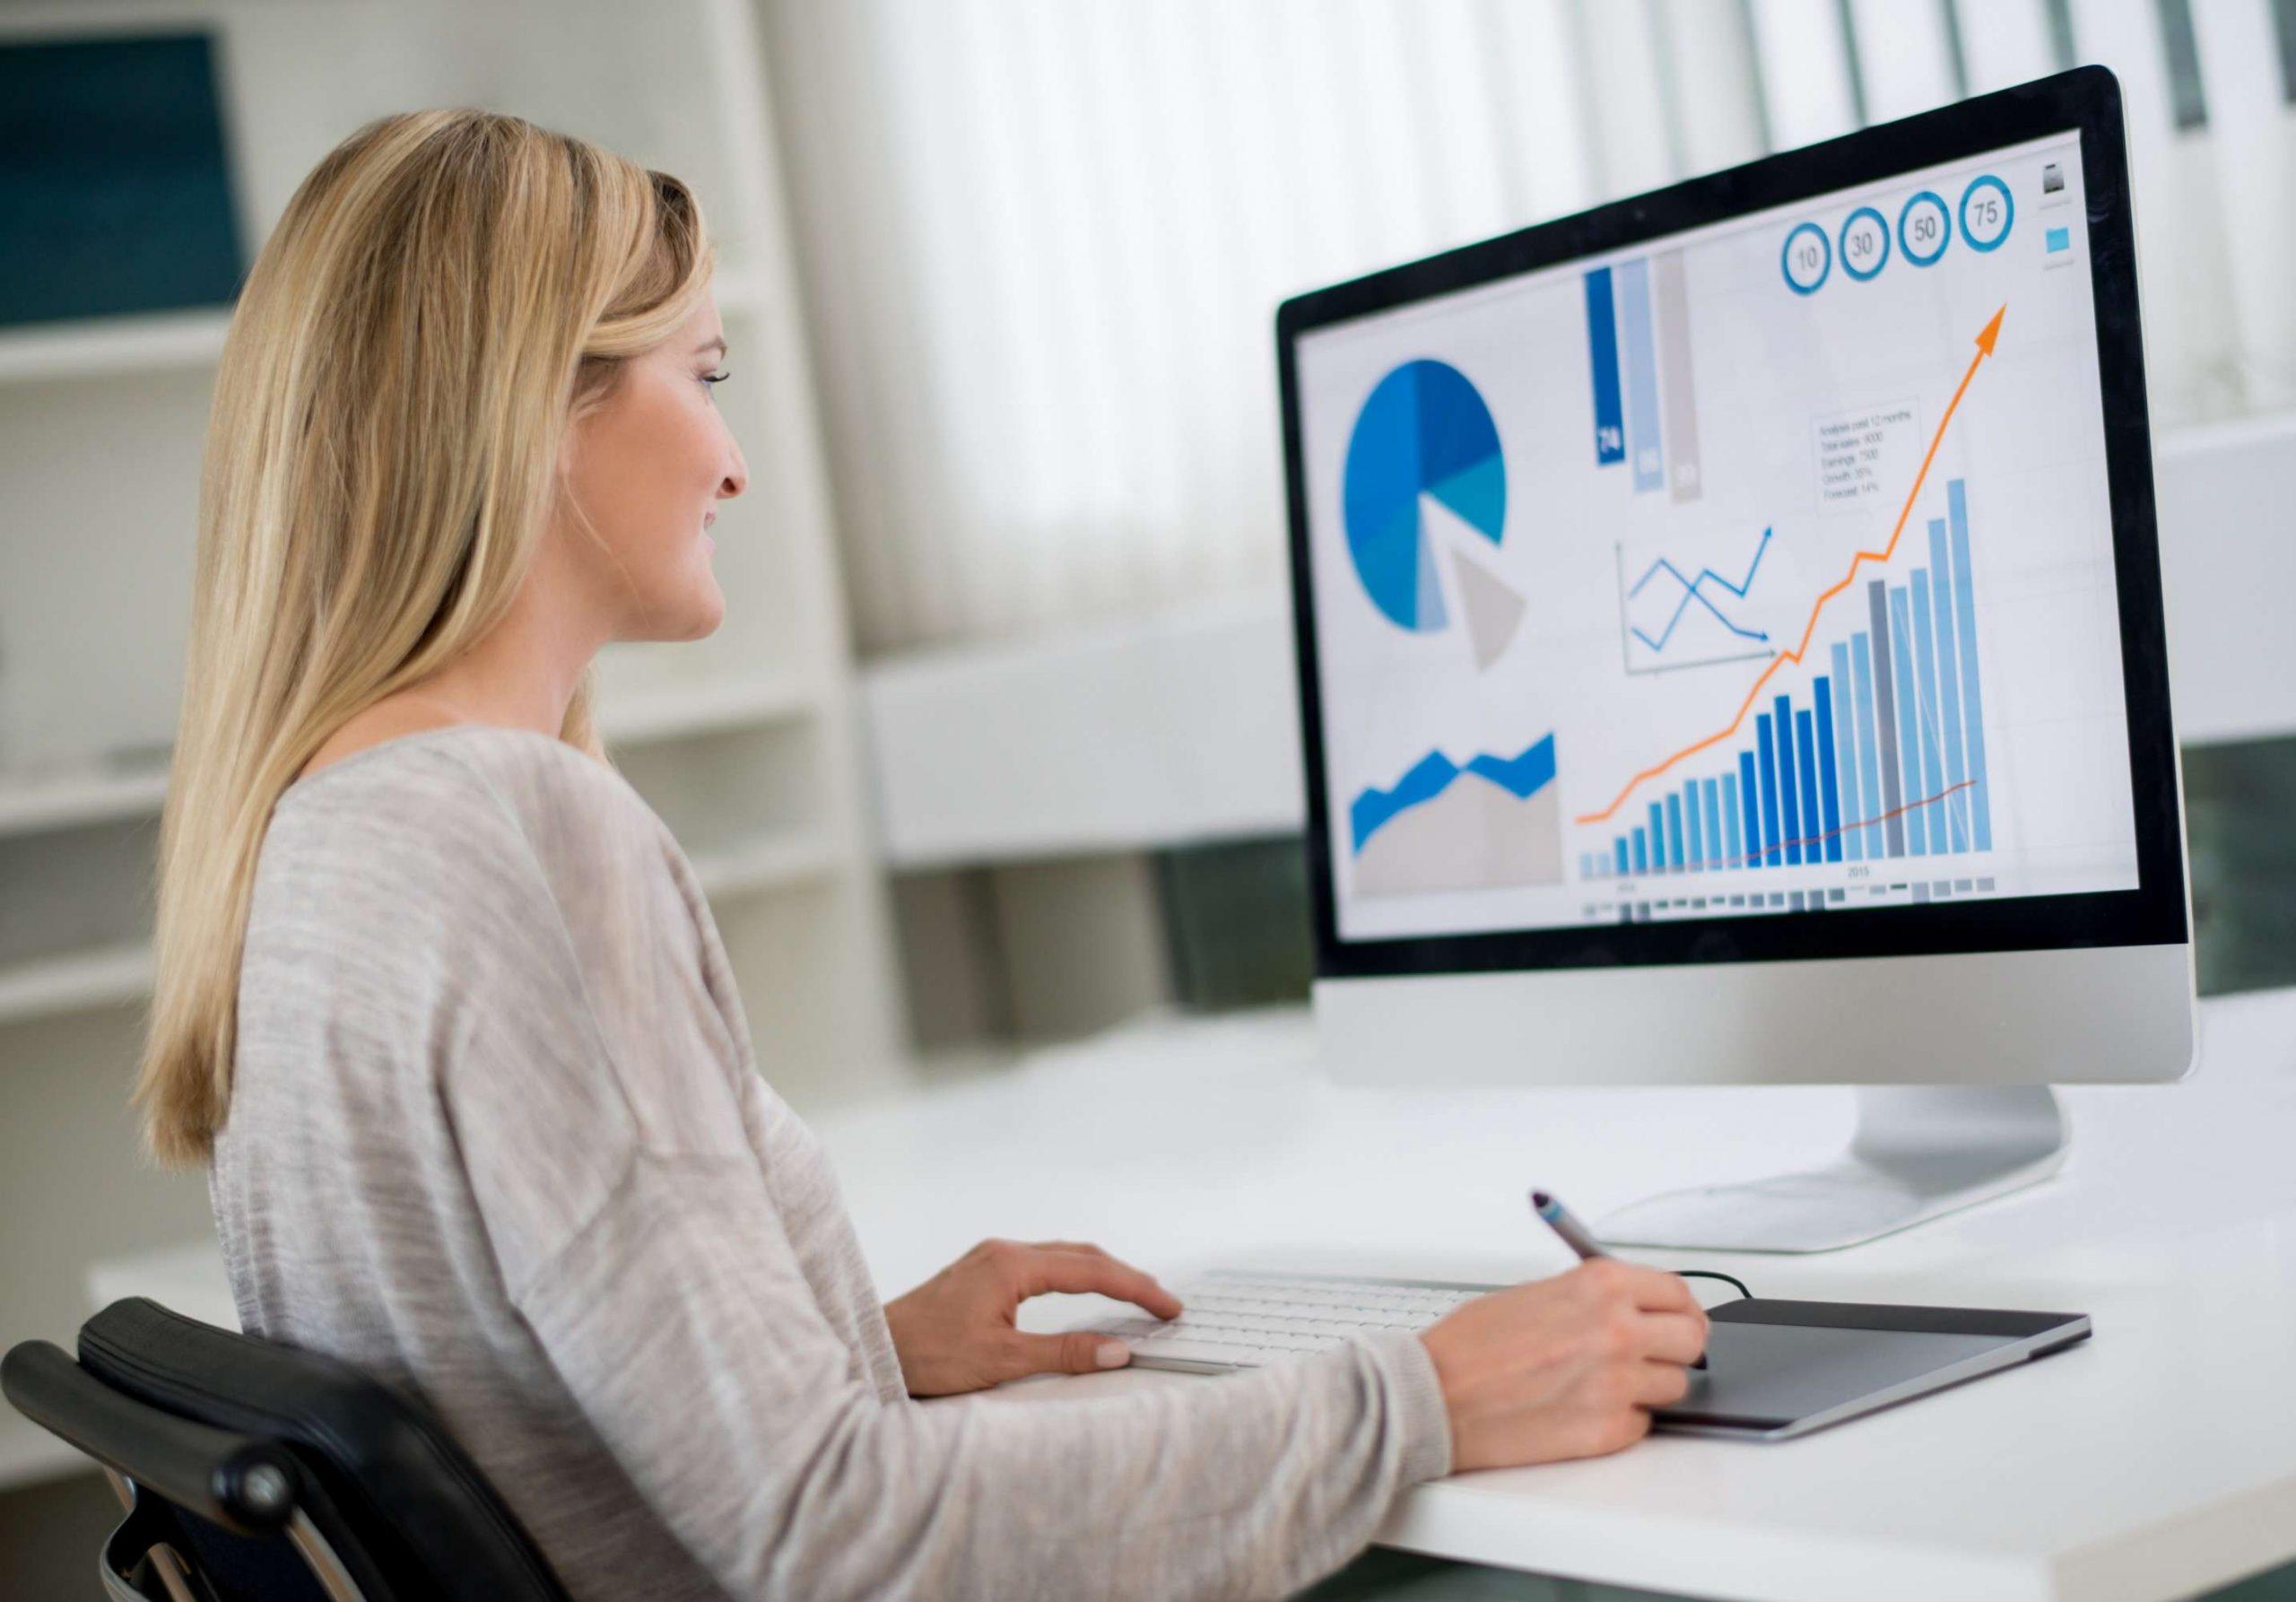 Tecnologia nas empresas - Argo Solutions - Simplifying your journey